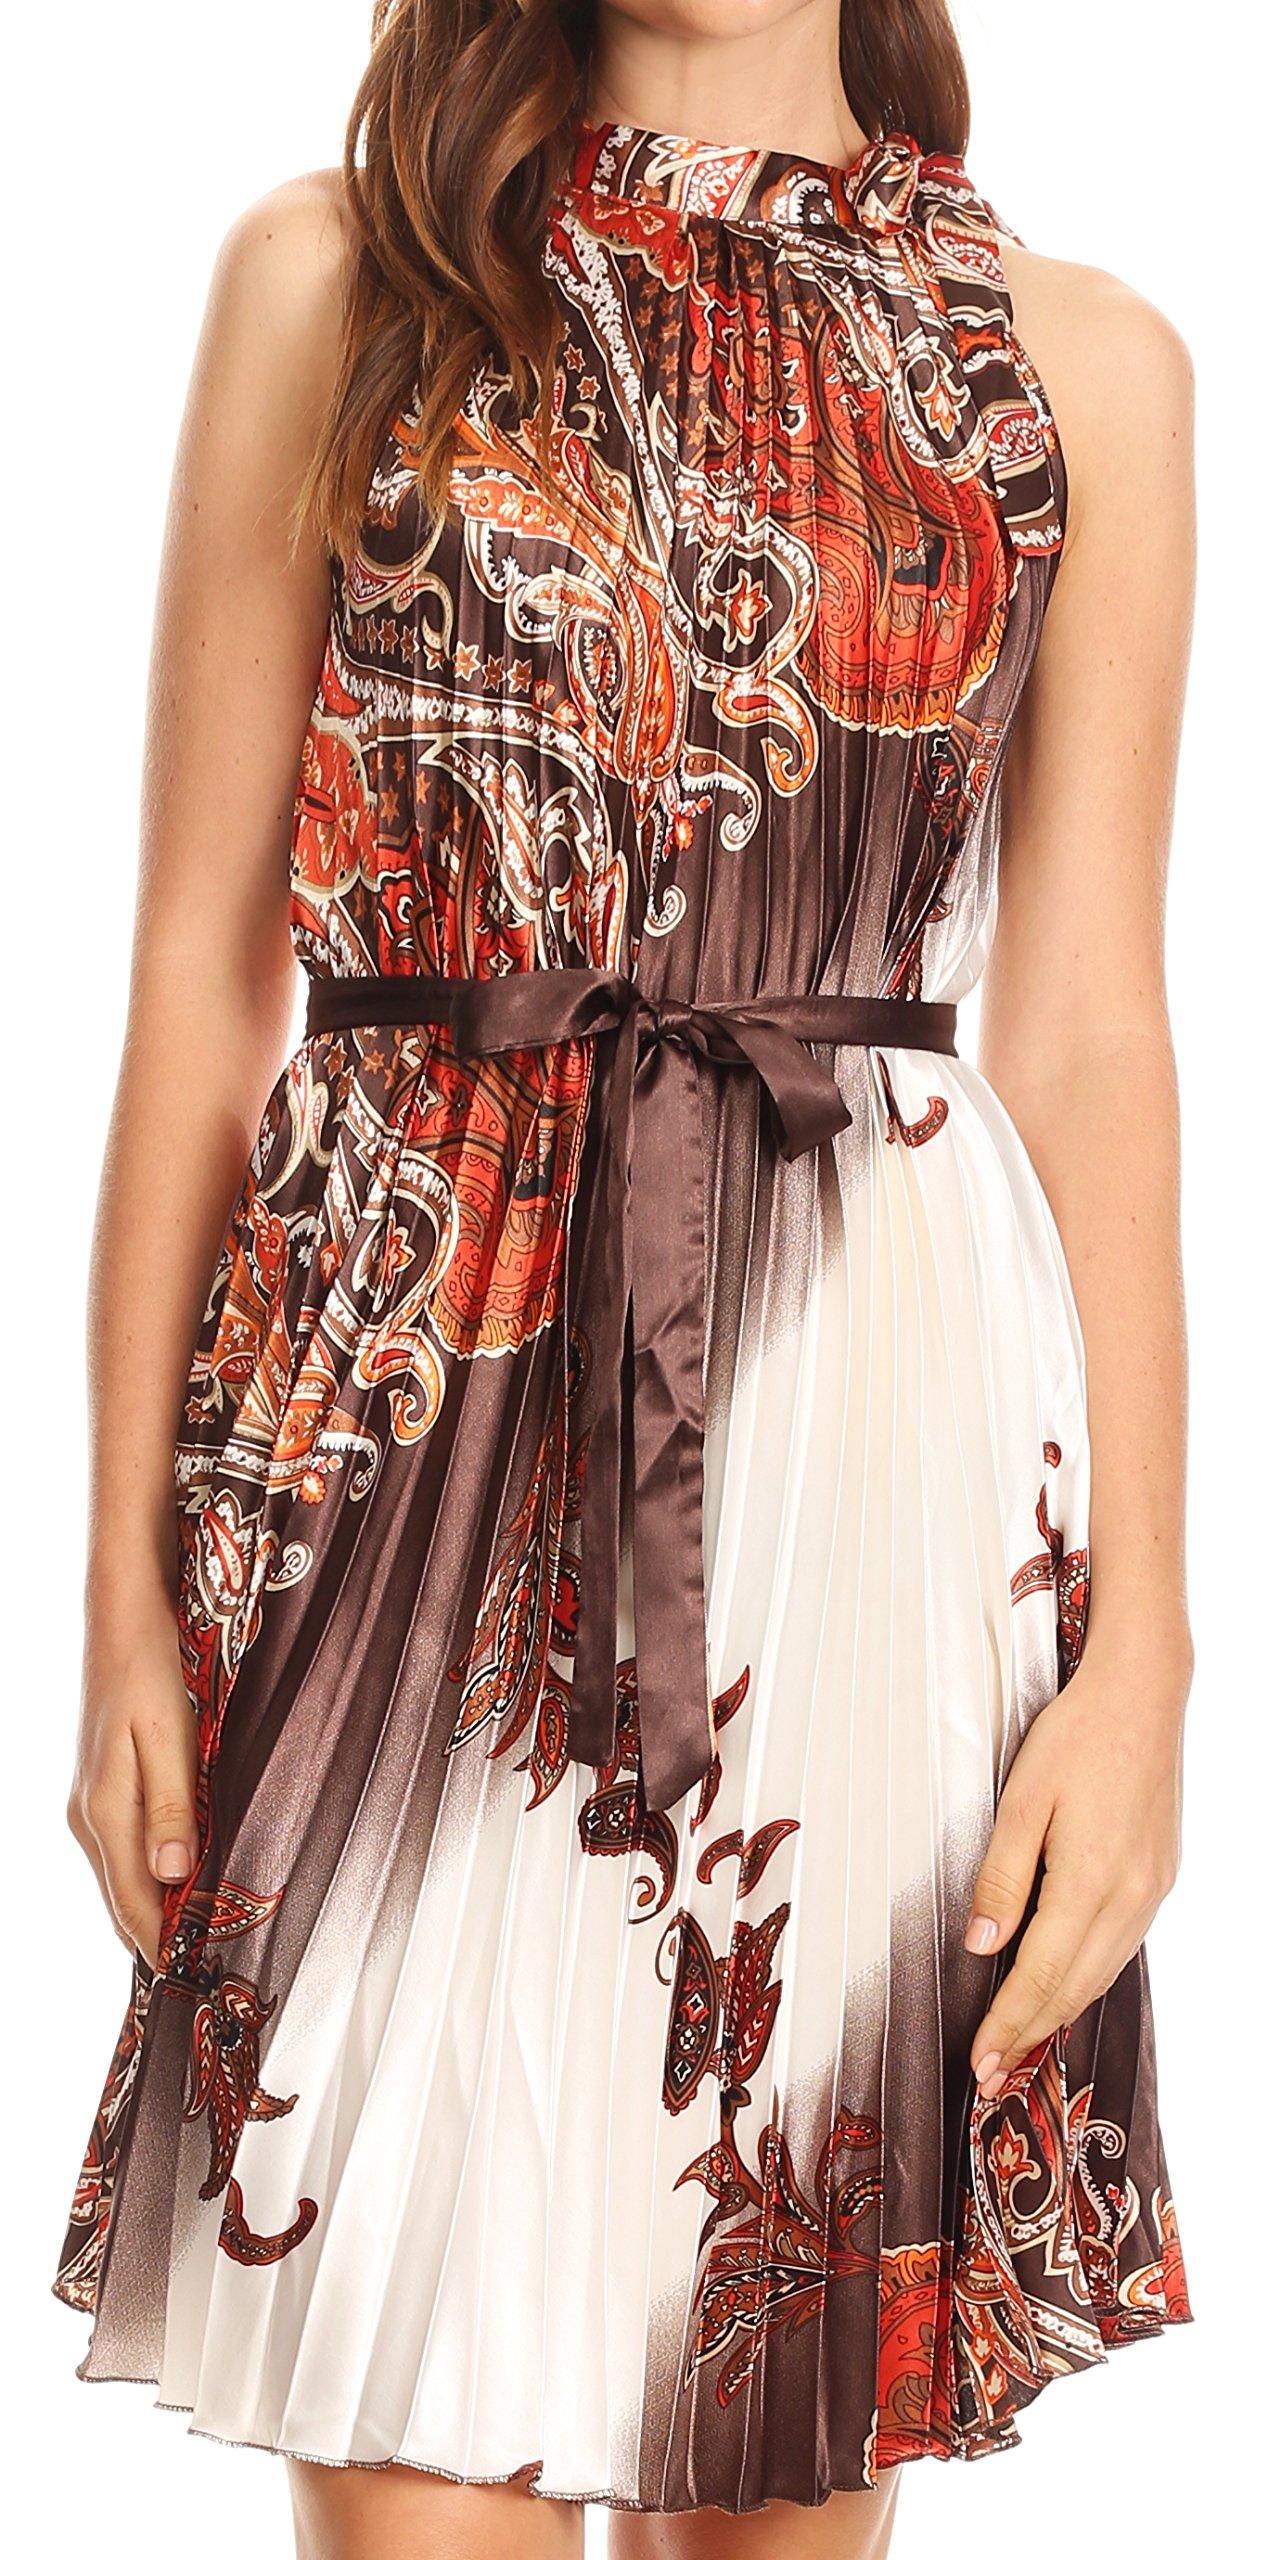 Available at Amazon: Sakkas Bettina Shift Accordion Pleated Satin Sleeveless Short Dress